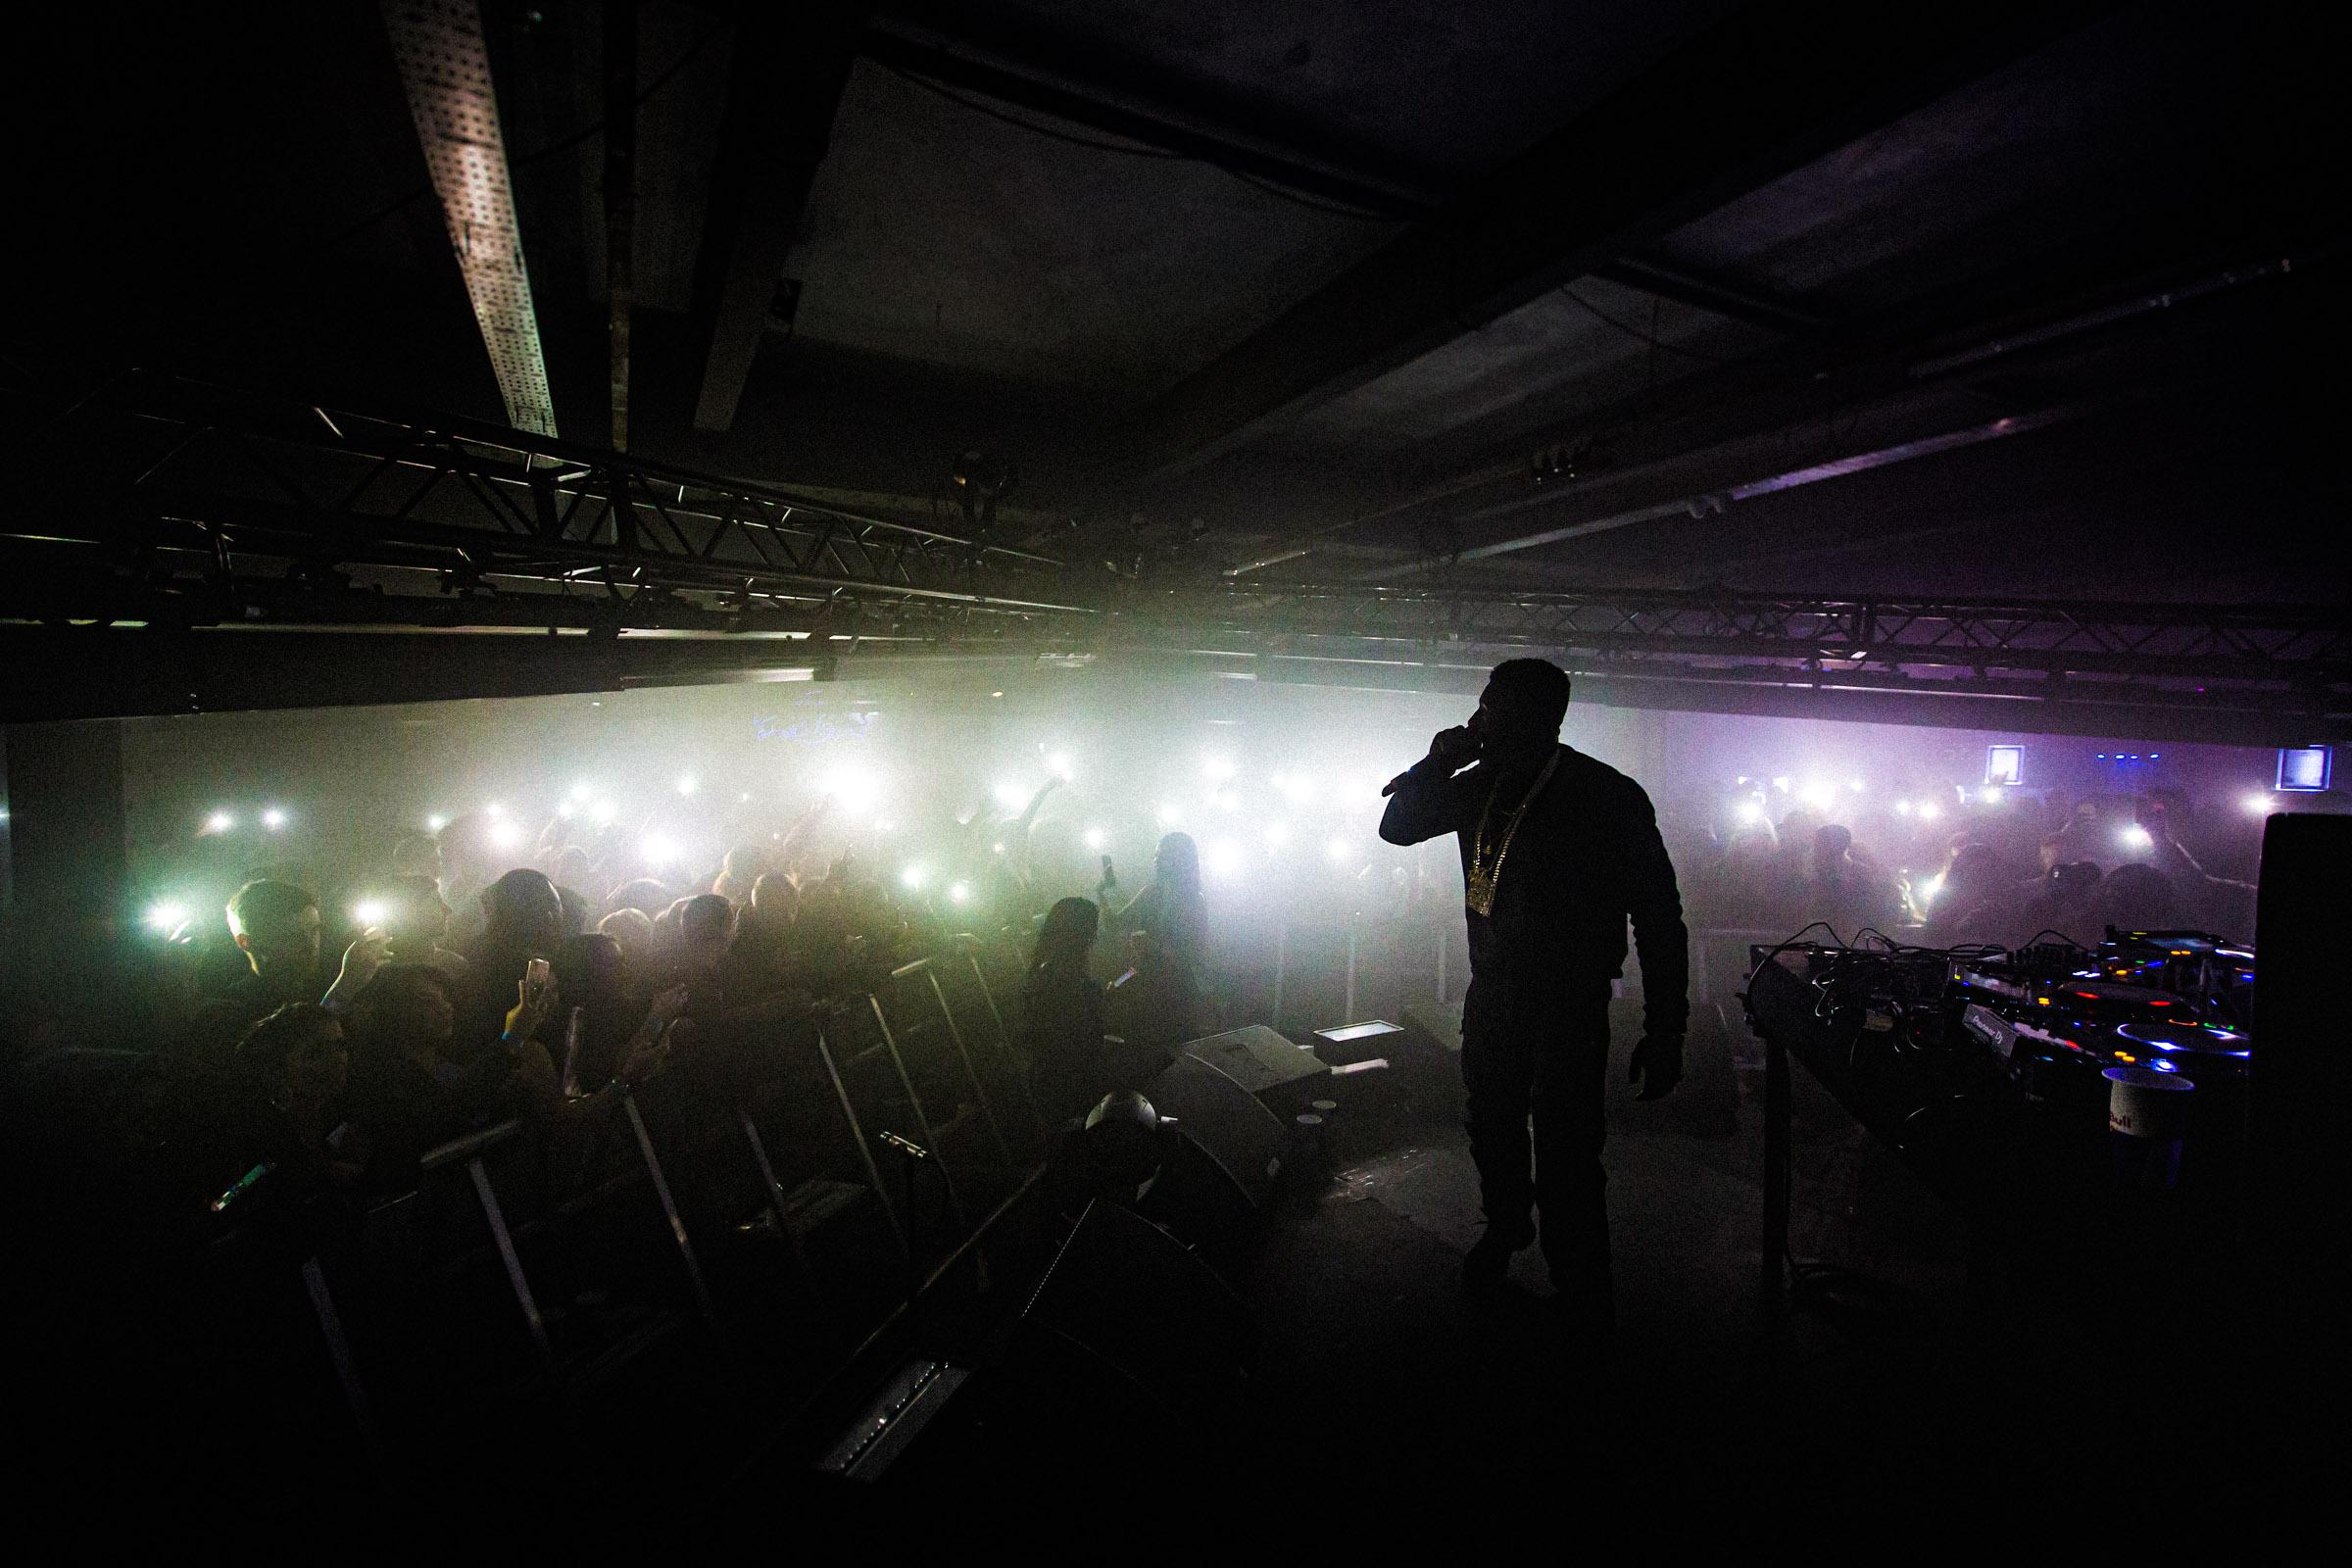 Music - Mist